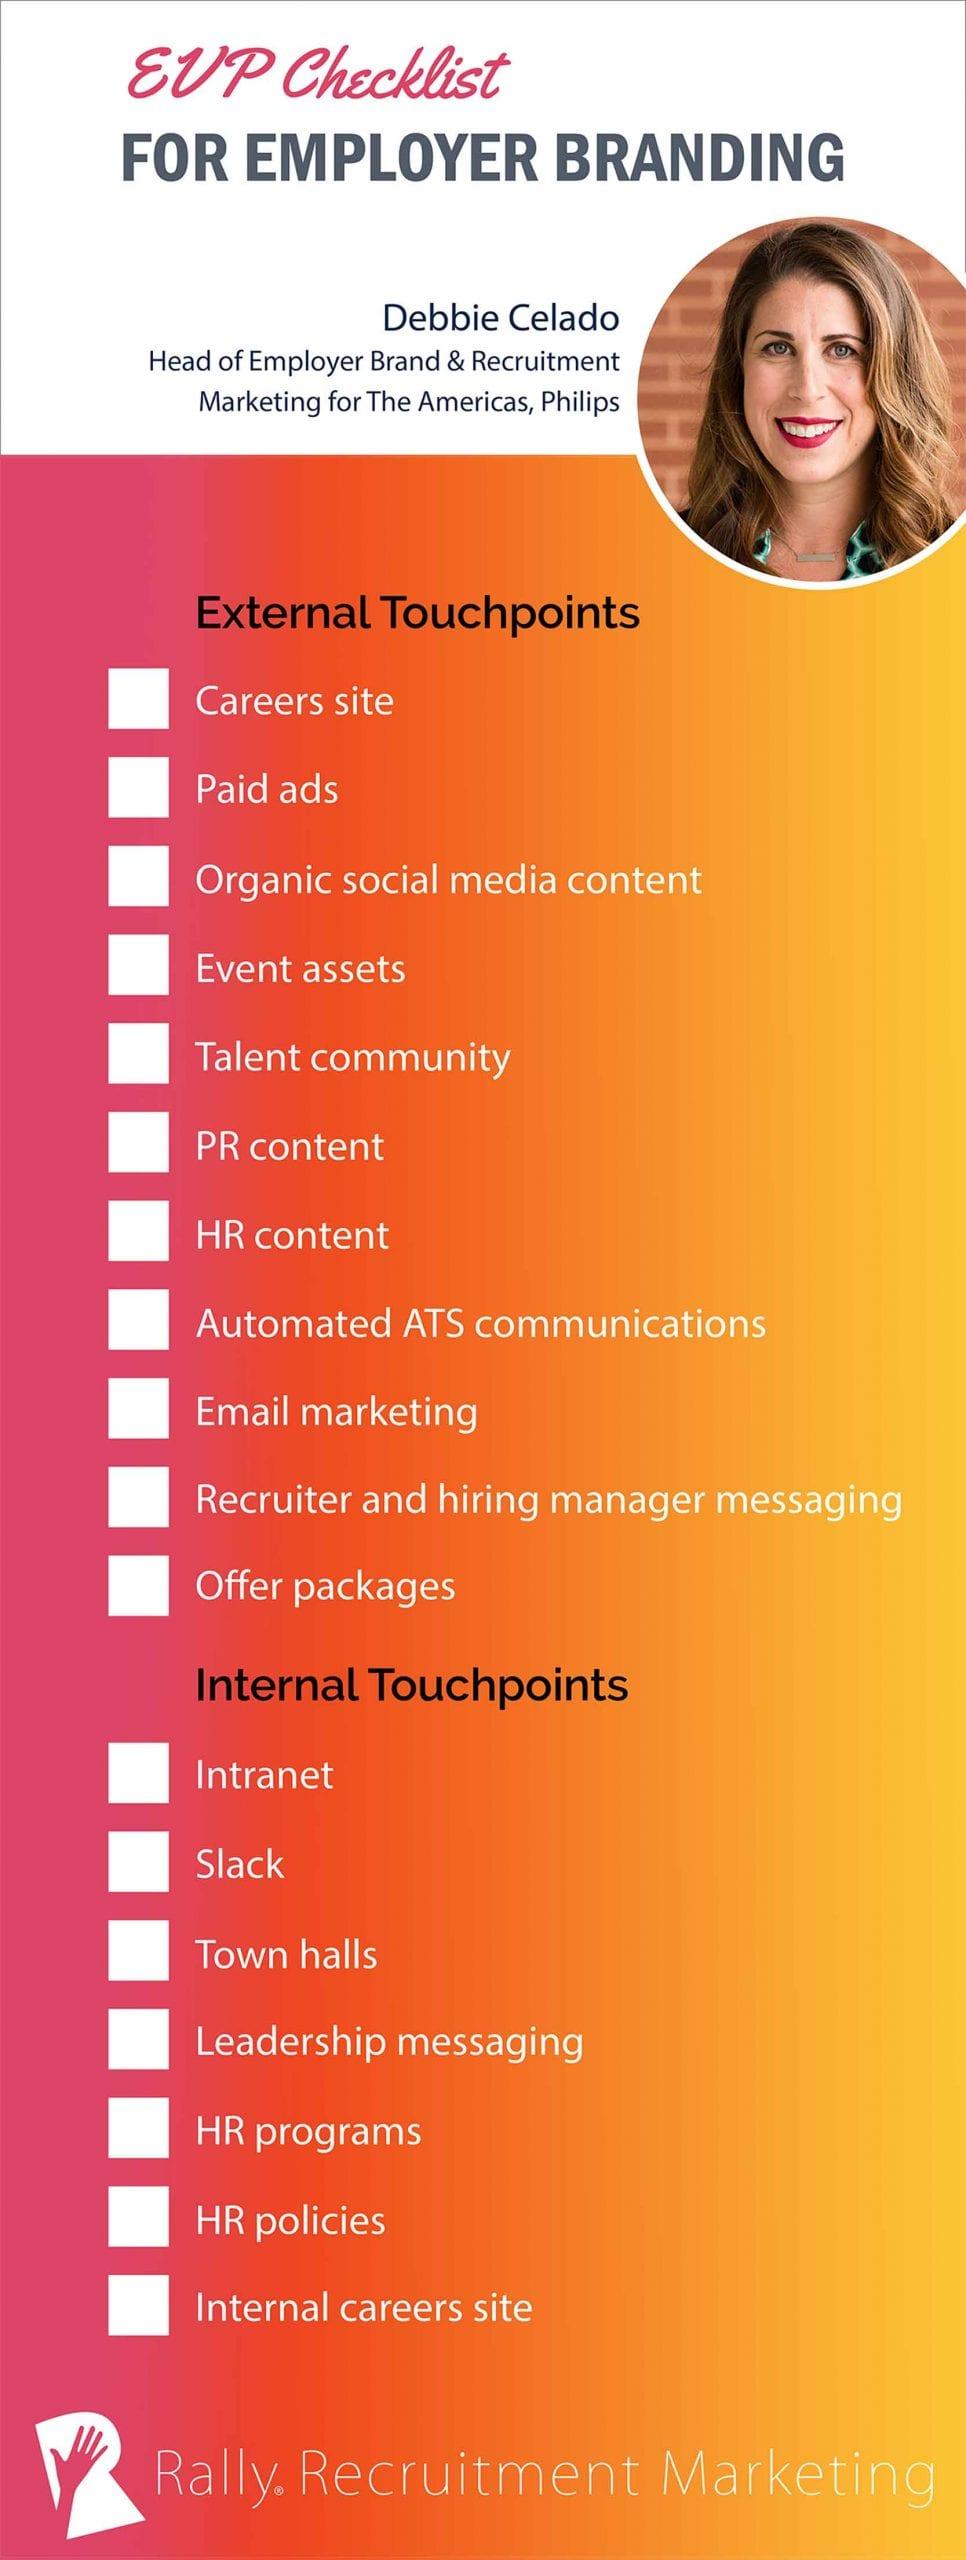 EVP checklist